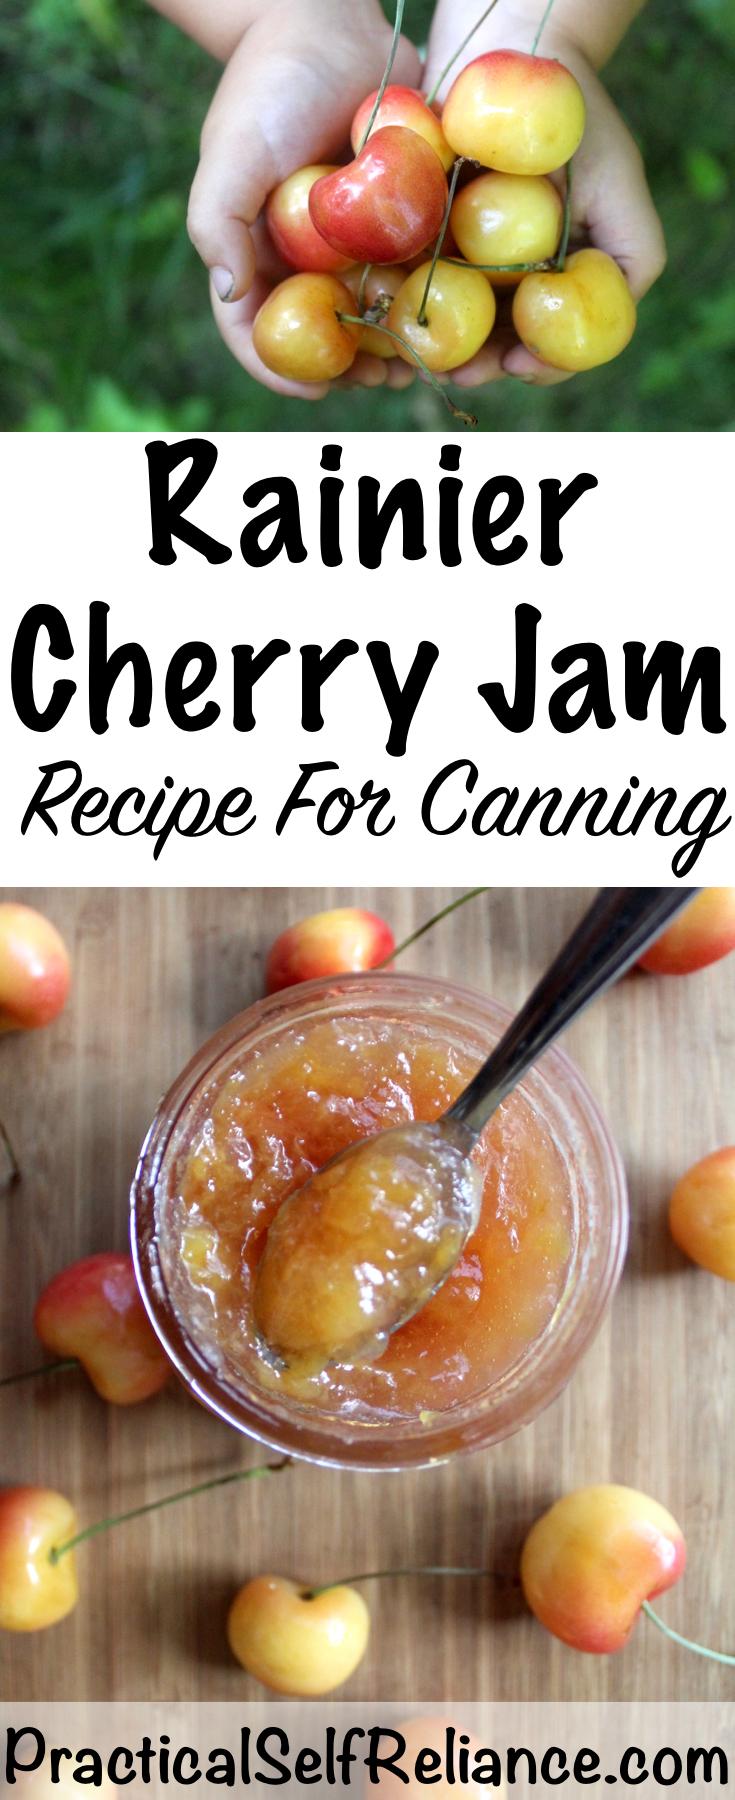 Rainier Cherry Jam Recipe For Canning #cherry #rainiercherry #cherryjam #jamrecipes #foodpreservation #canning #preservingfood  #jam #homesteading